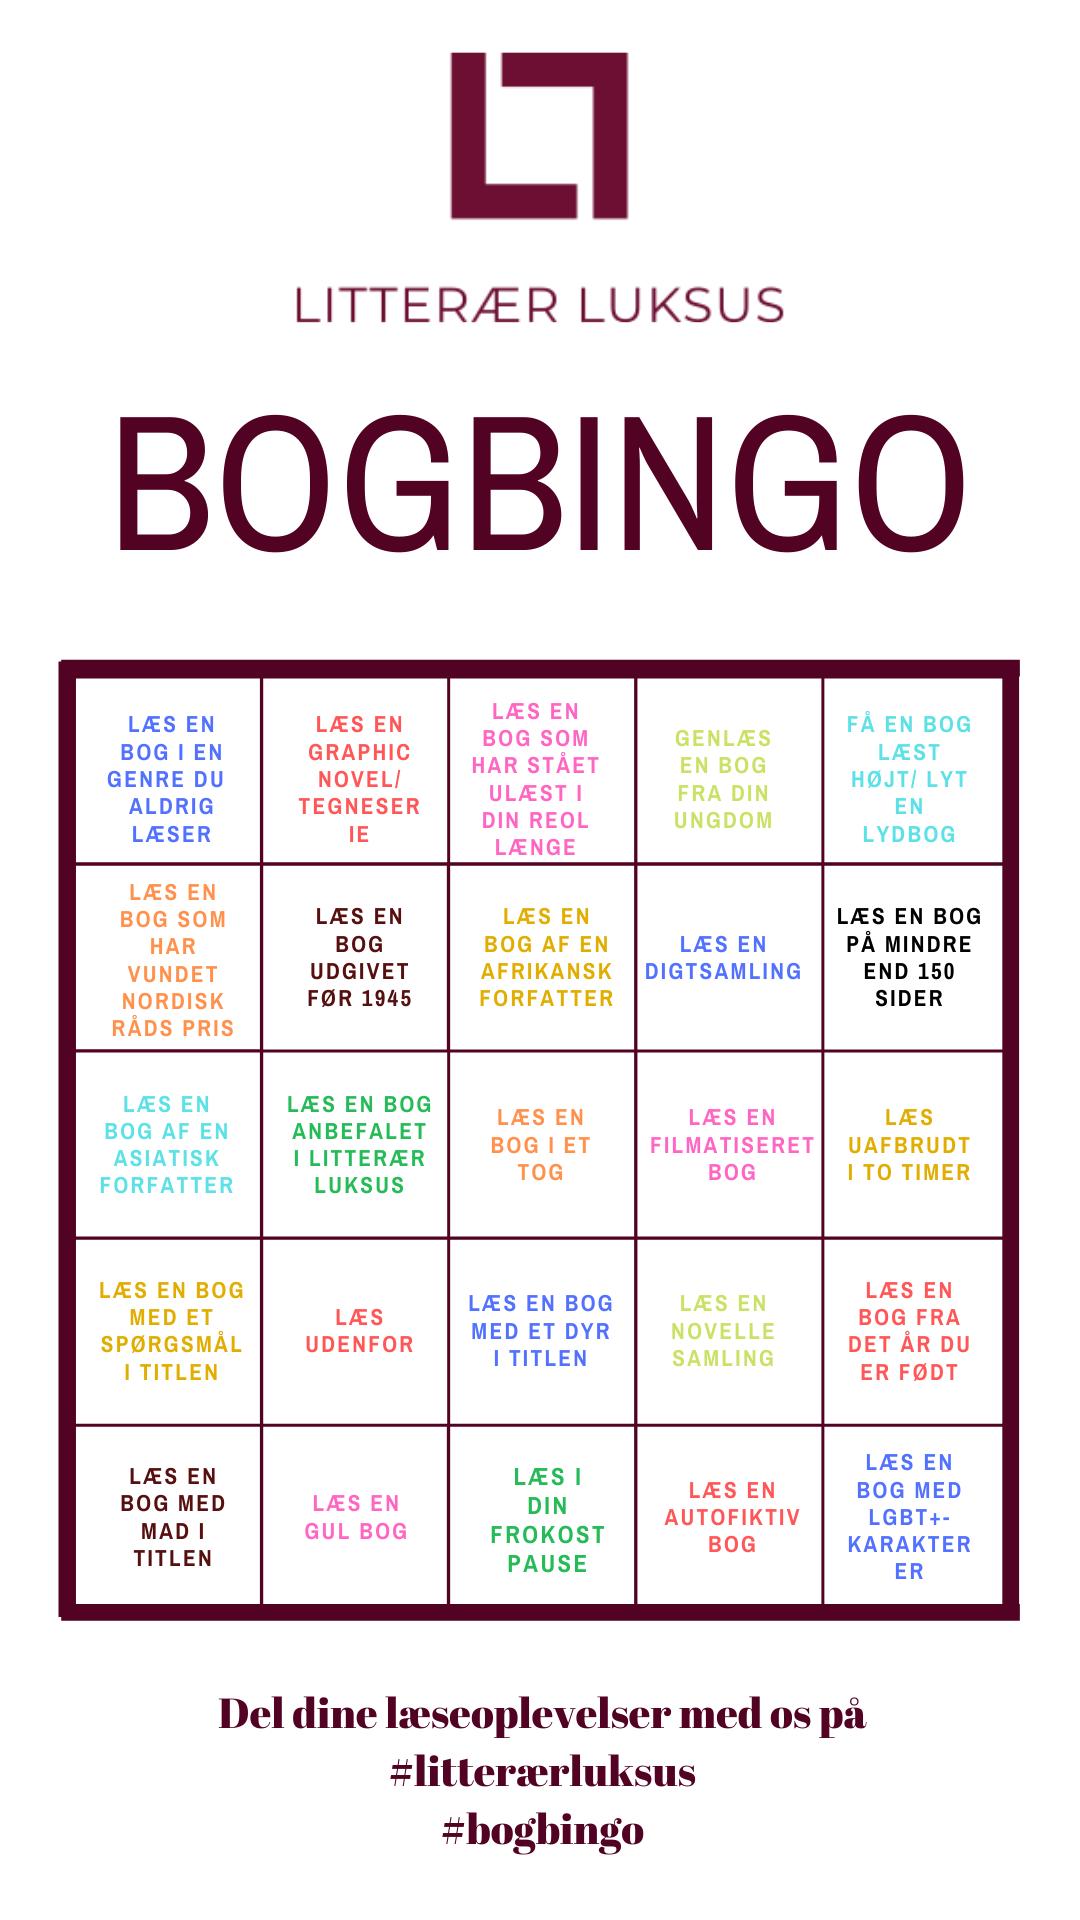 Litterær Luksus Bogbingo-plade